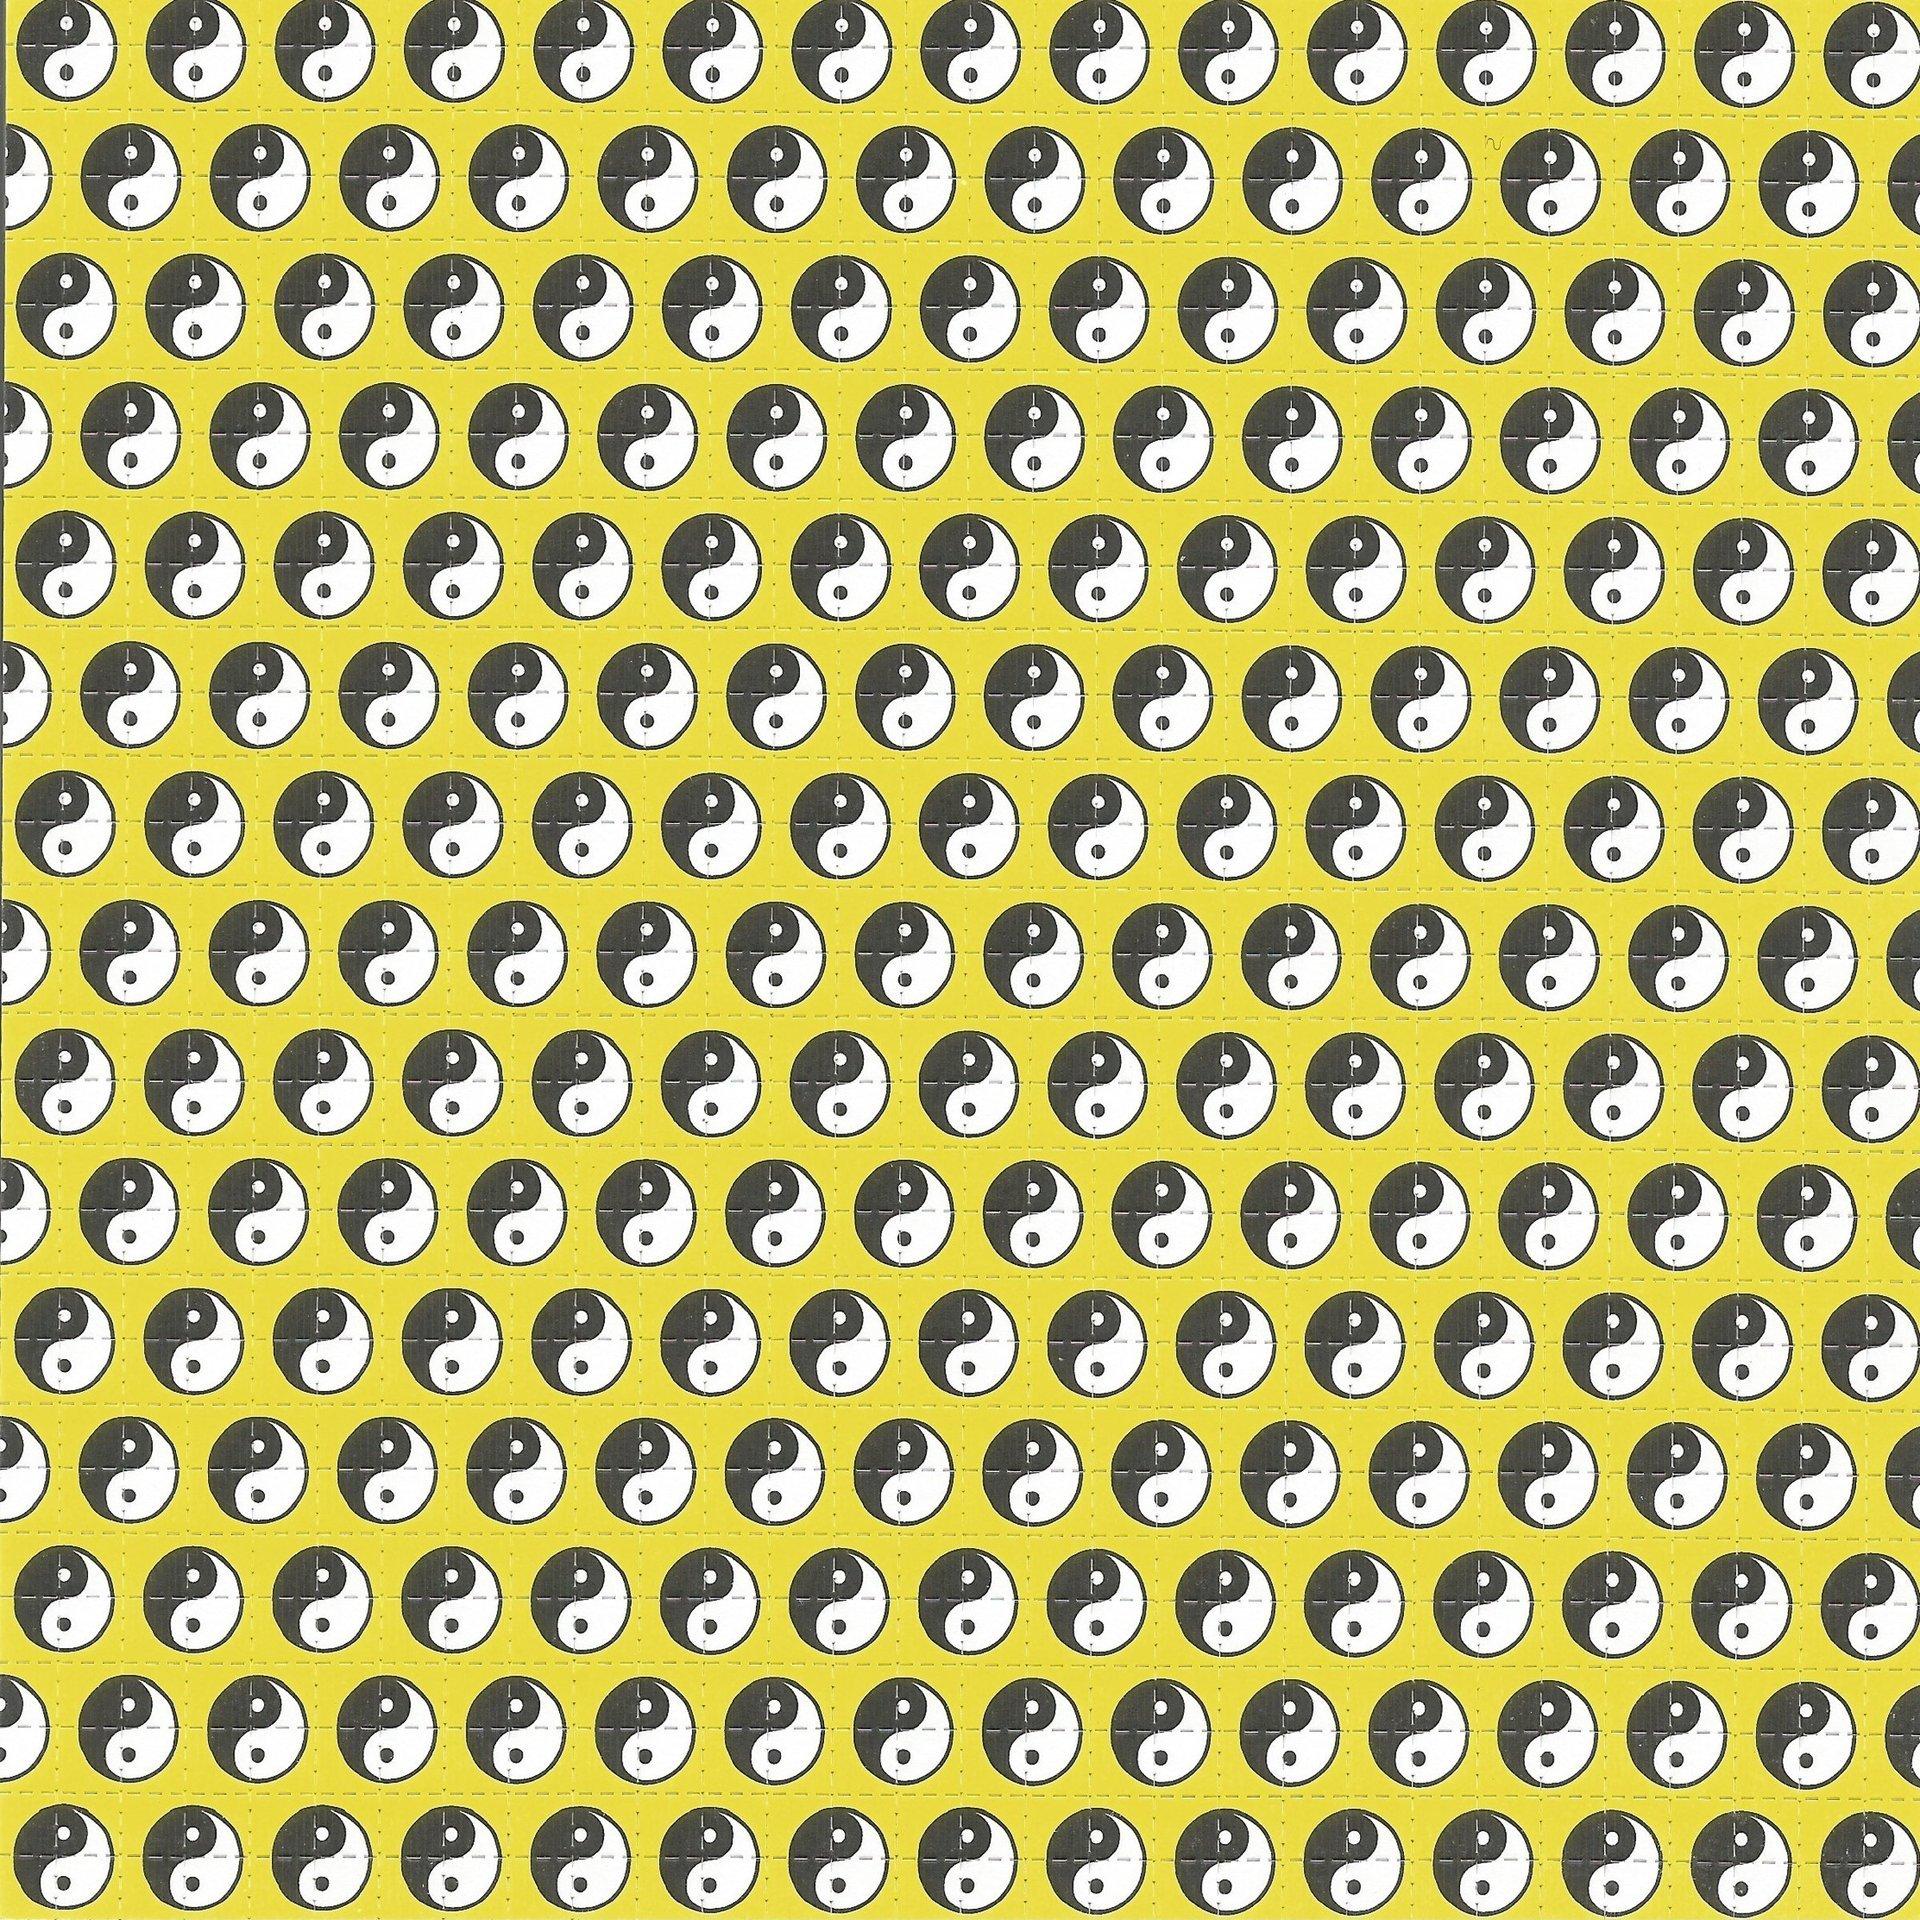 Yin Yans - Yellow Blotter